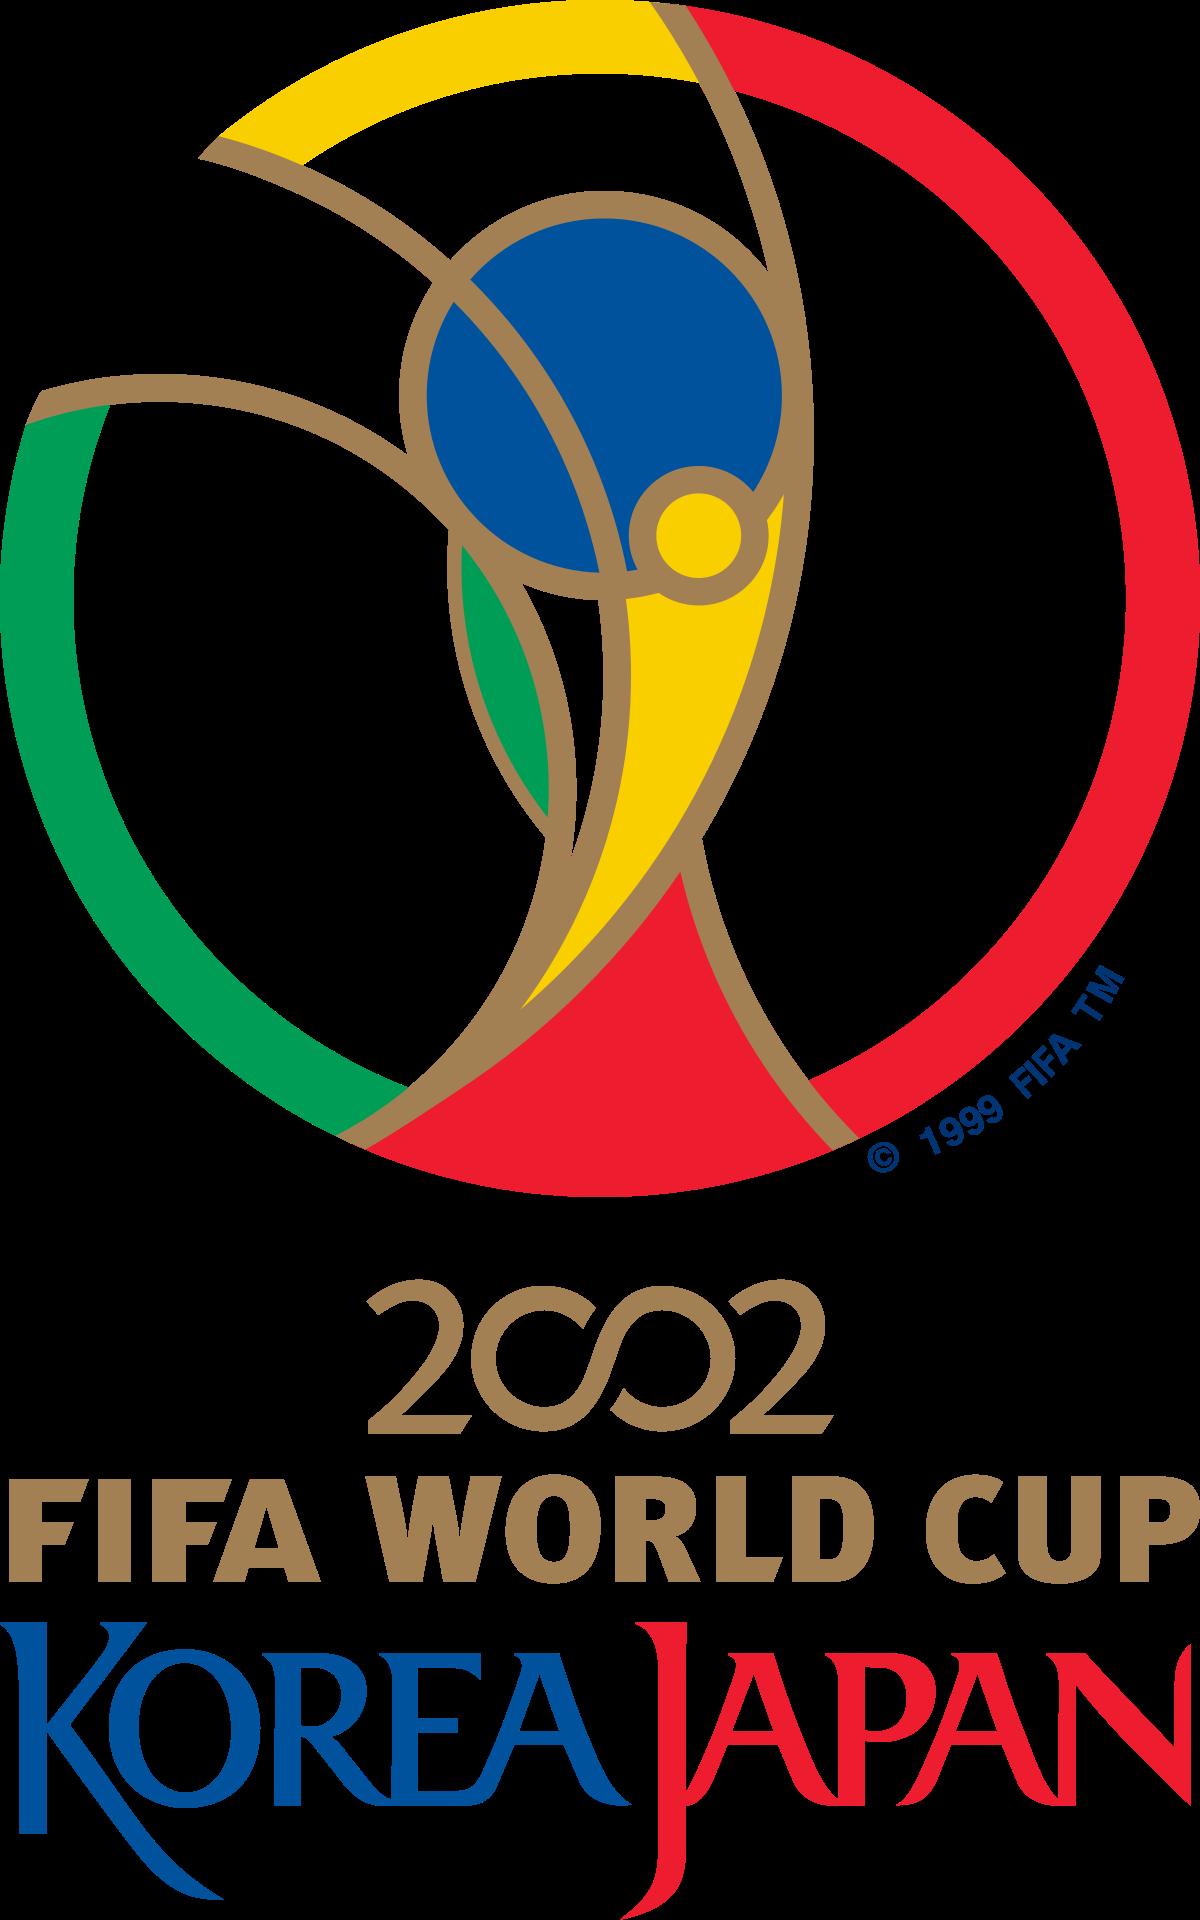 2002 FIFA World Cup.